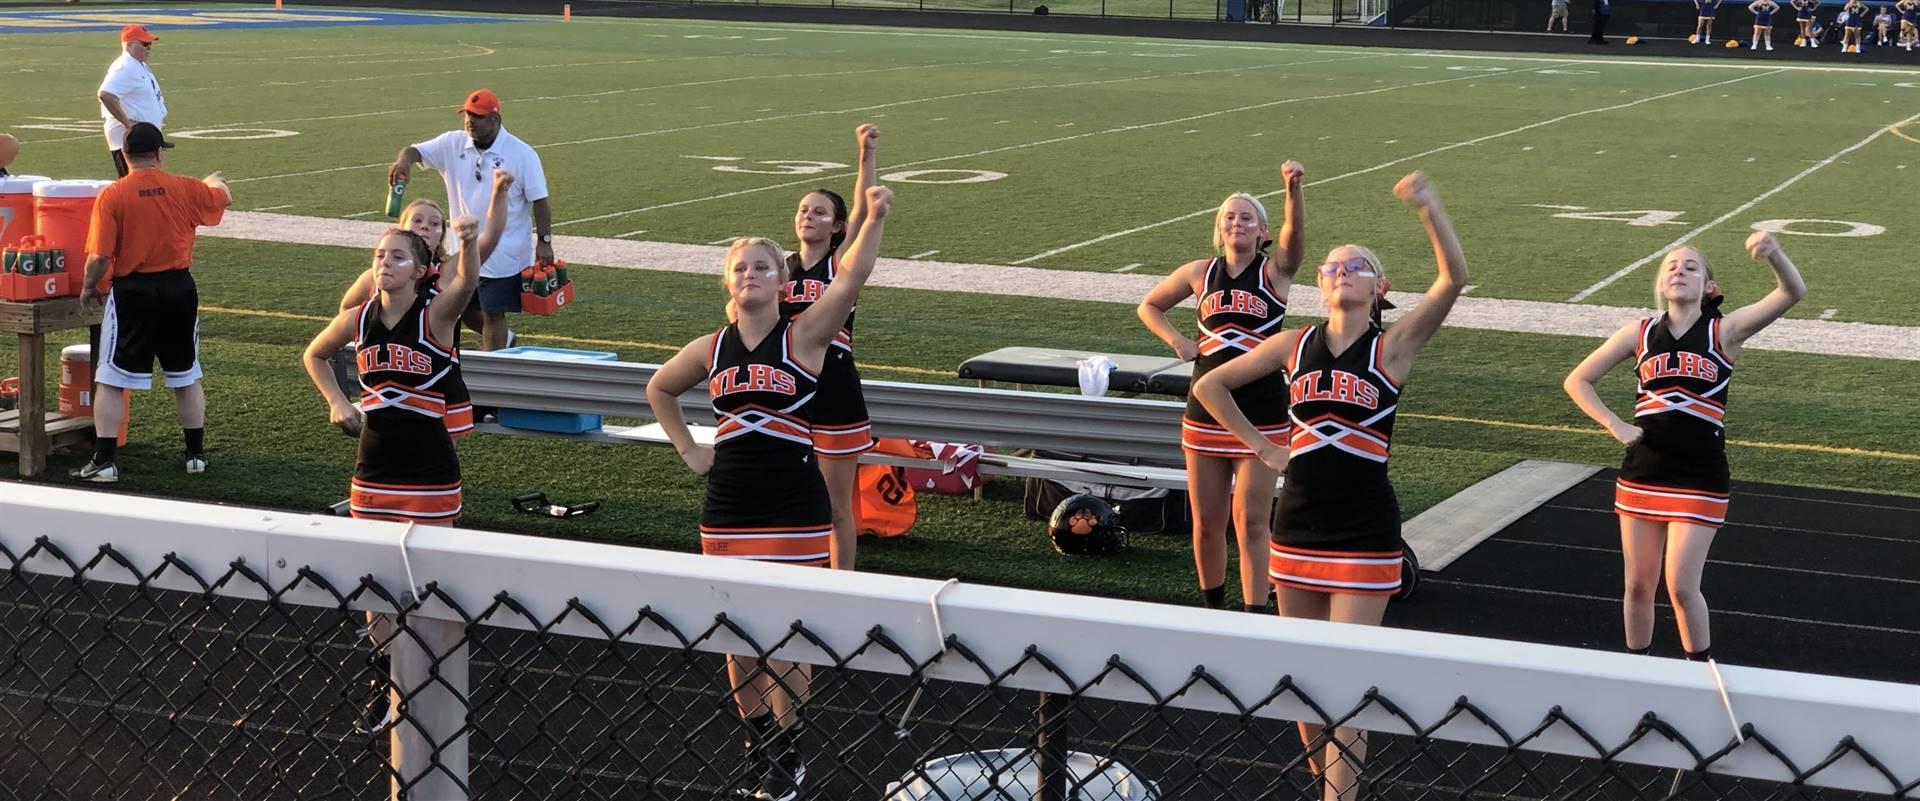 Varsity Cheerleaders at Maysville